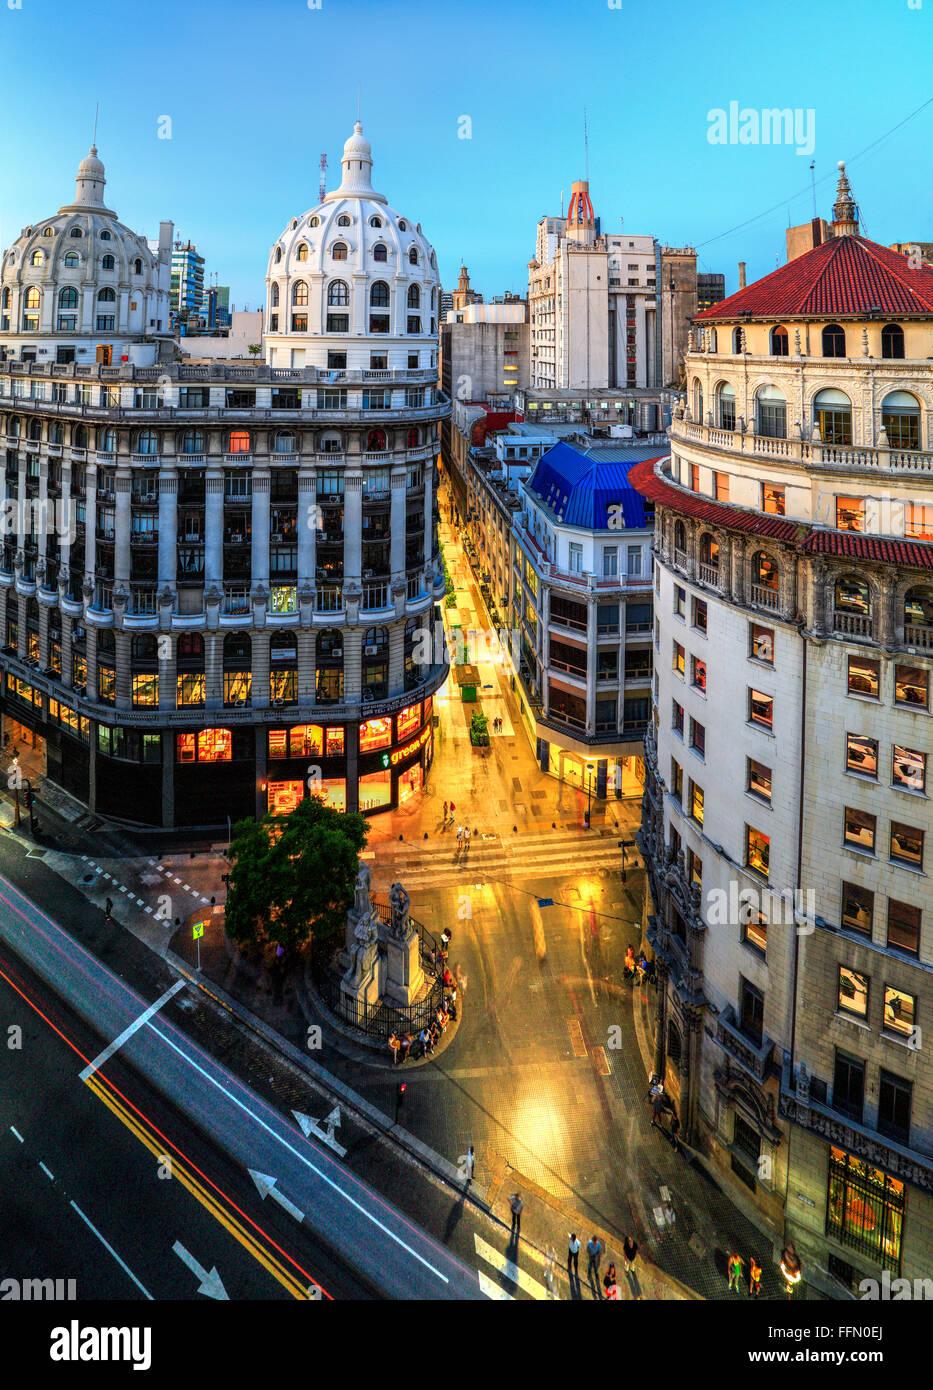 Vista aérea de la calle Florida (peatonal). Buenos Aires, Argentina, Sudamérica Imagen De Stock